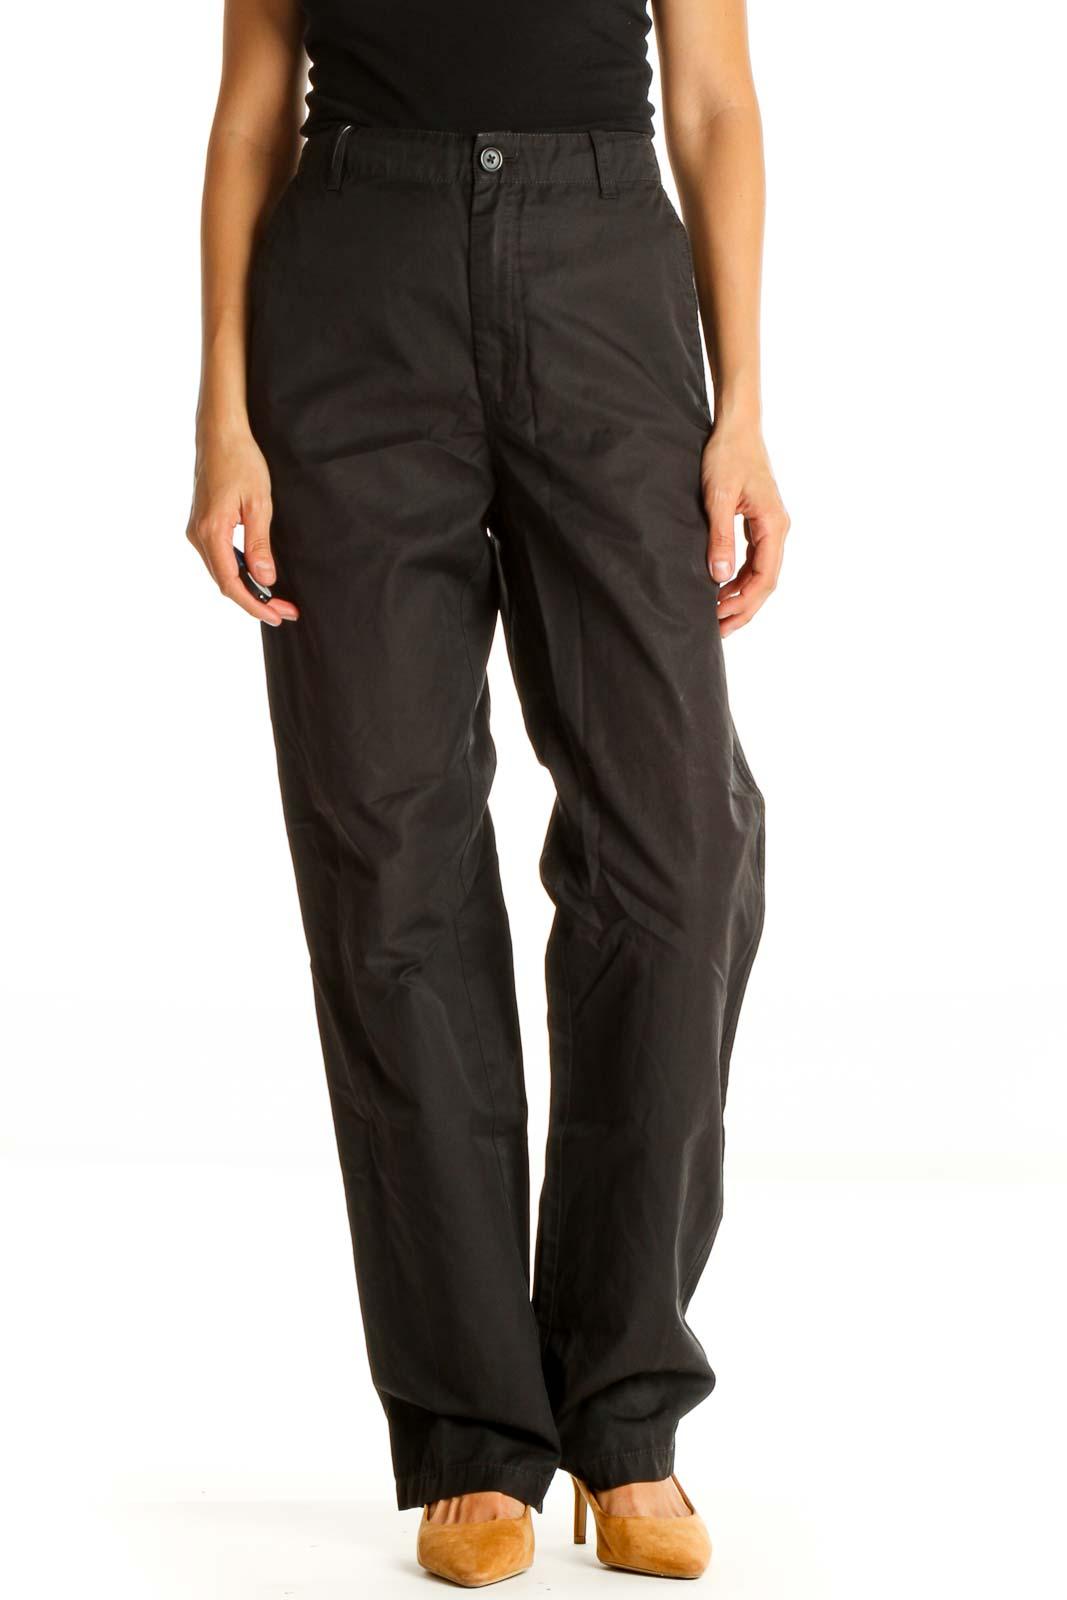 Black Solid Activewear Pants Front